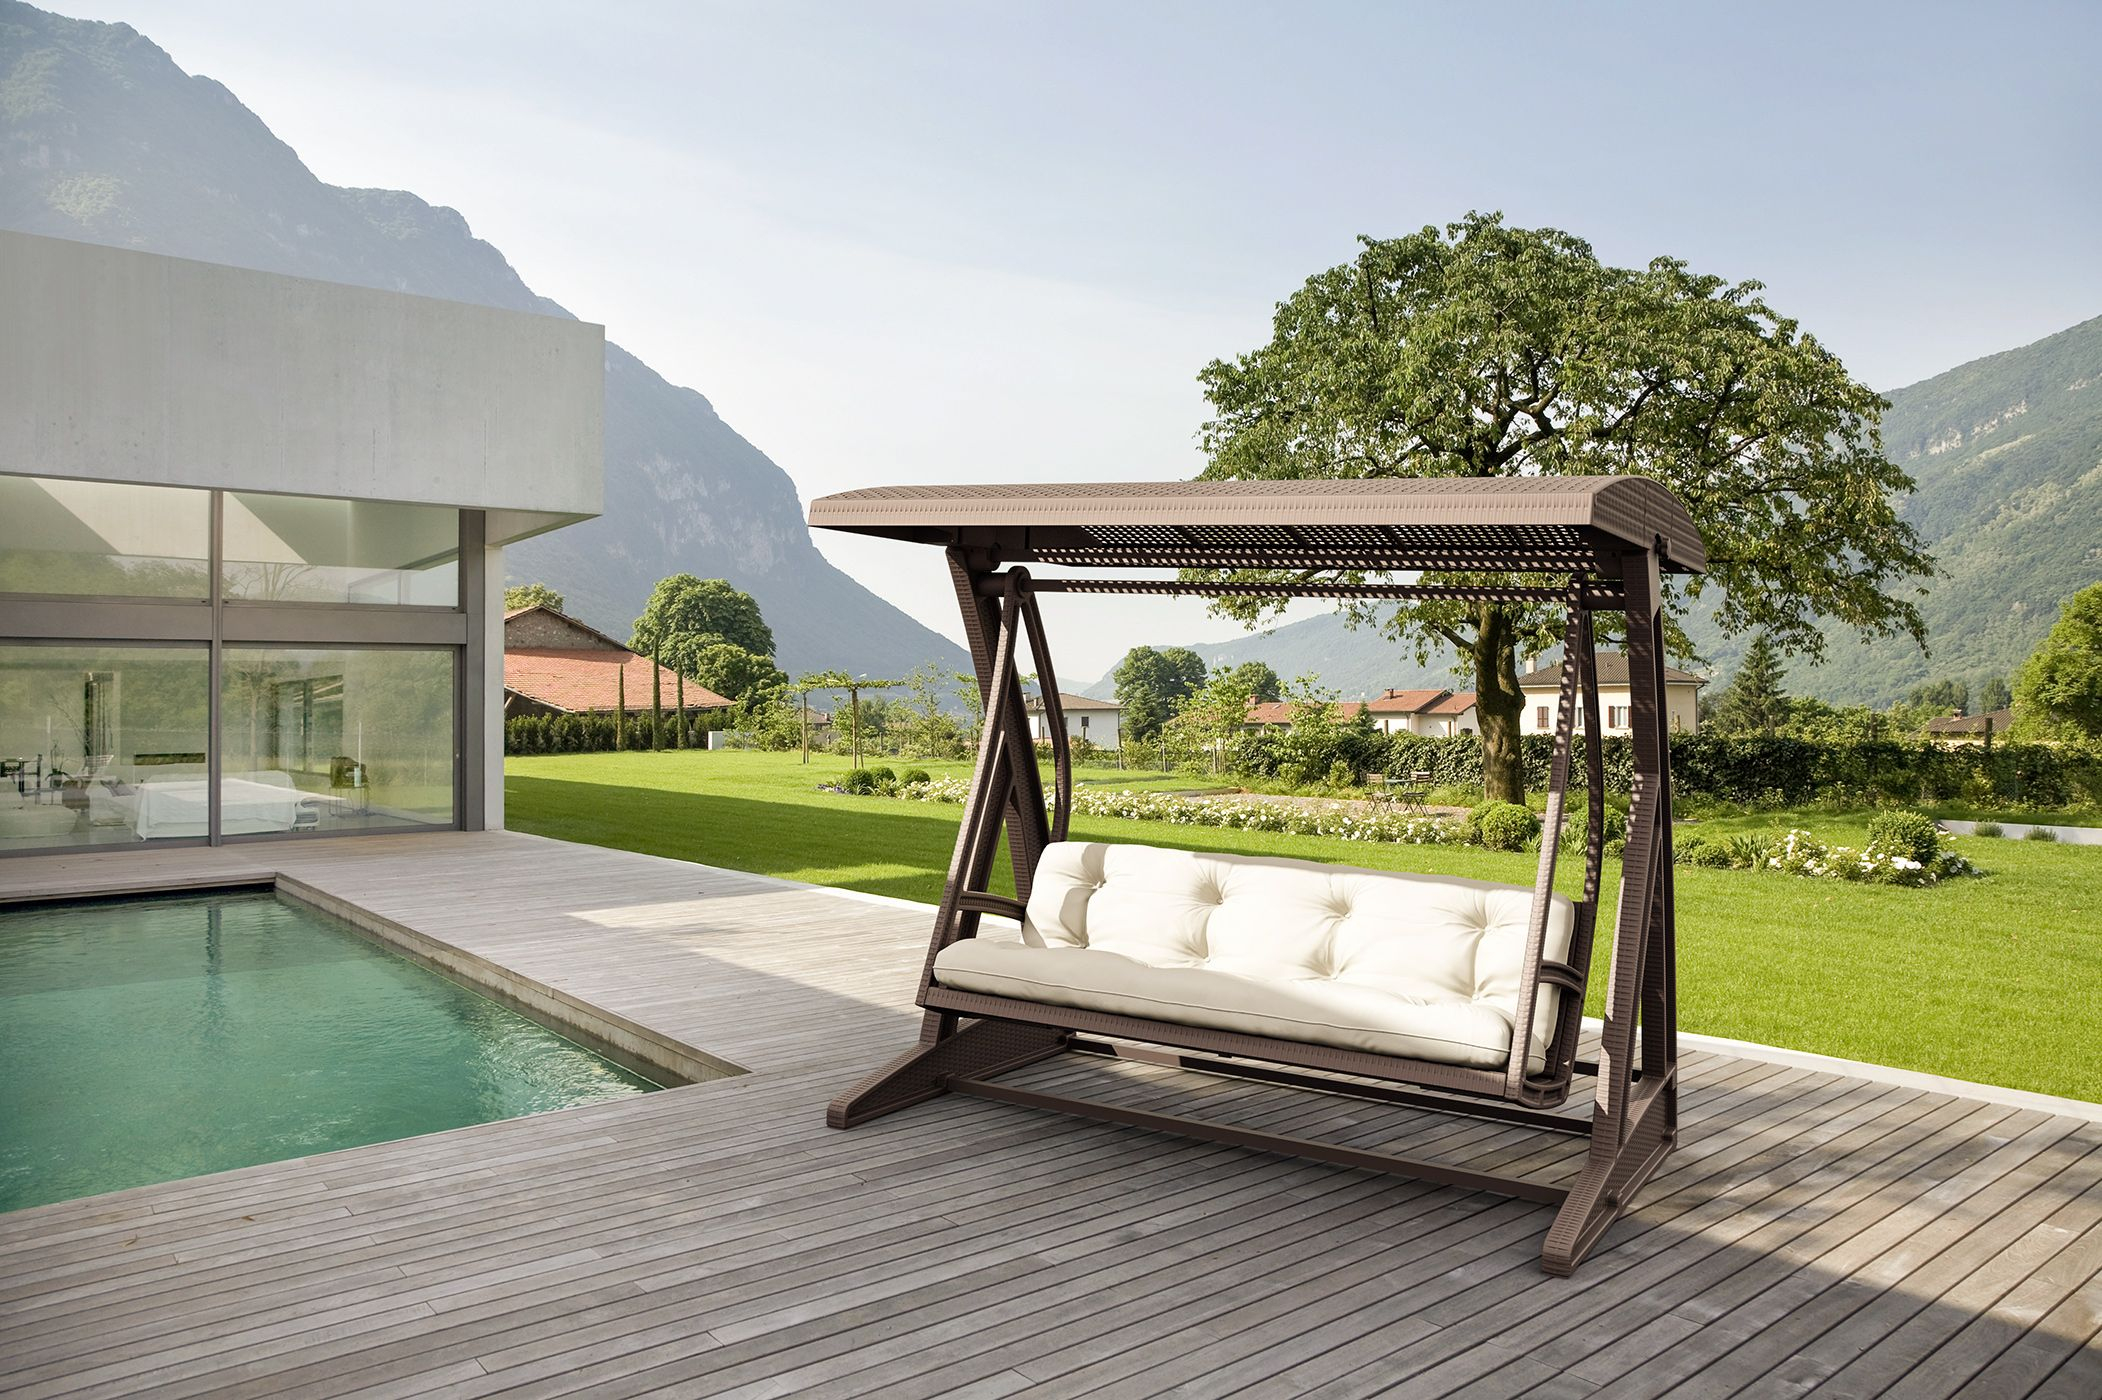 Kaliteli Ve Şık Bahçe Mobilyası Modelleri Lara Concept 'de ... serapportantà Bache Pour Salon De Jardin